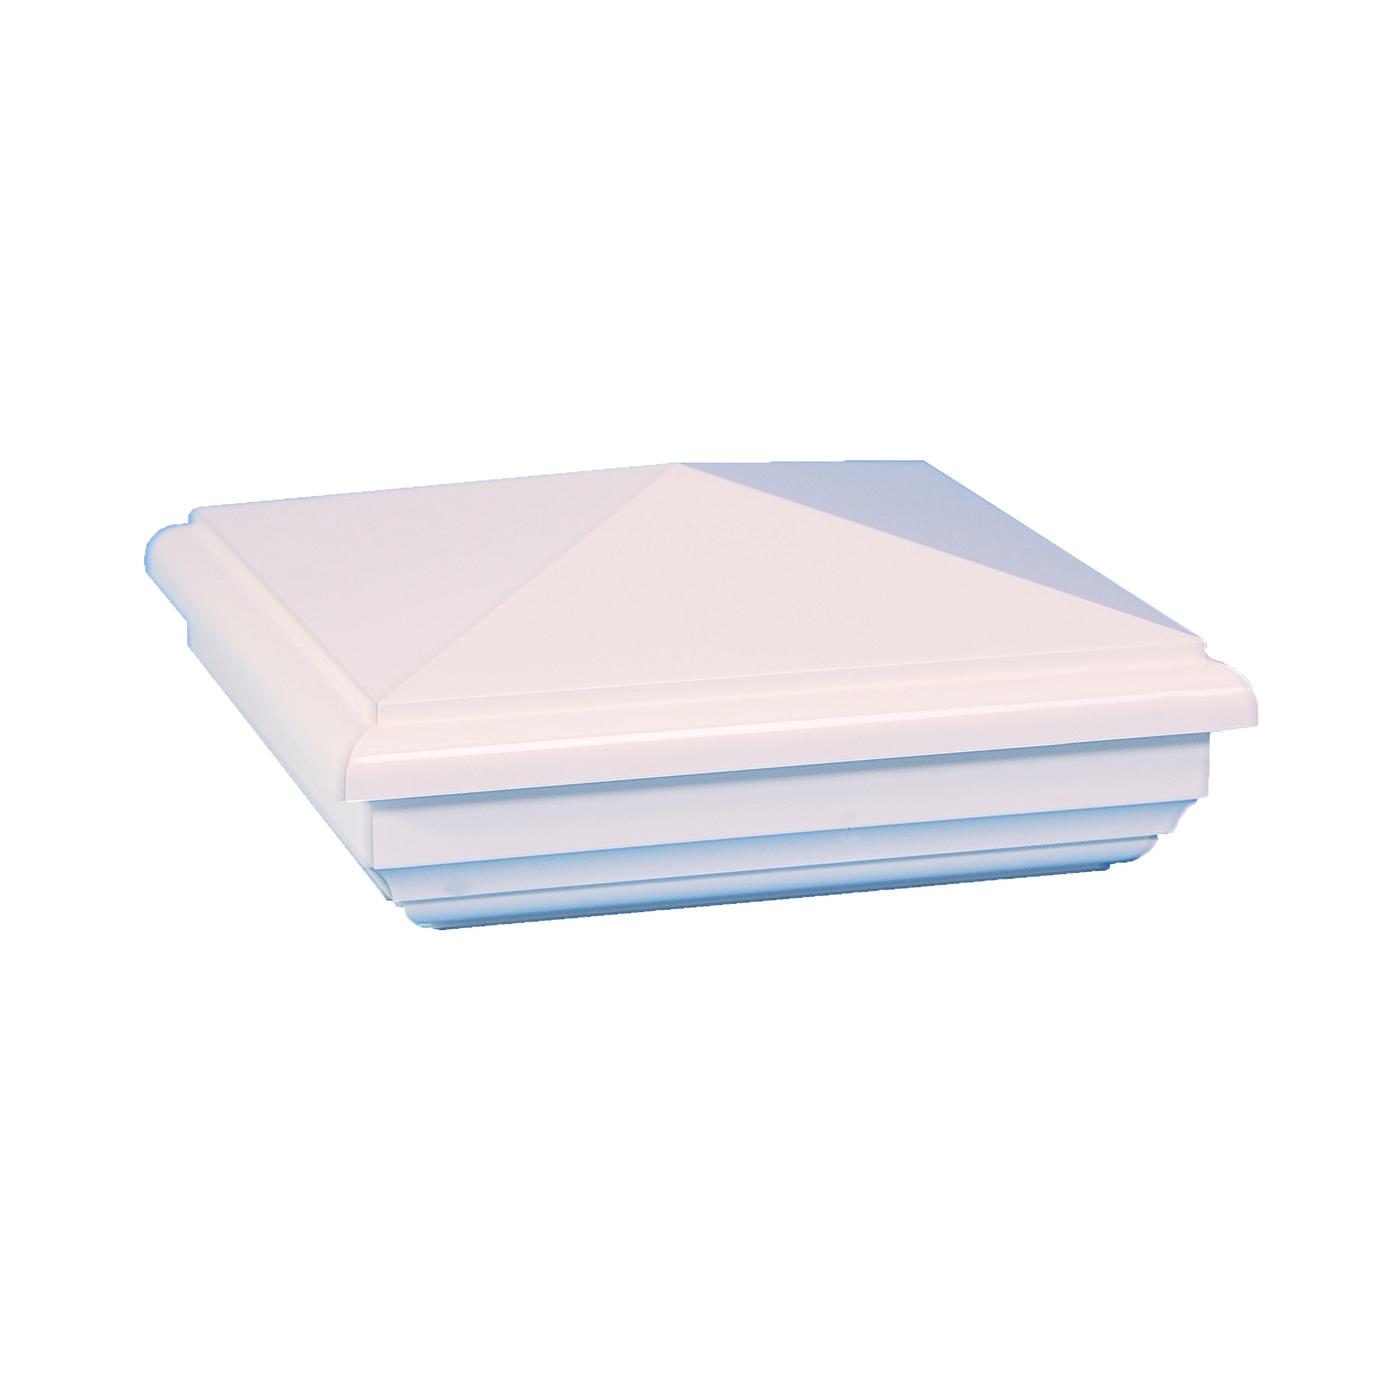 Classy Caps NE844 NEW ENGLAND PVC POST CAP 4X4 - White